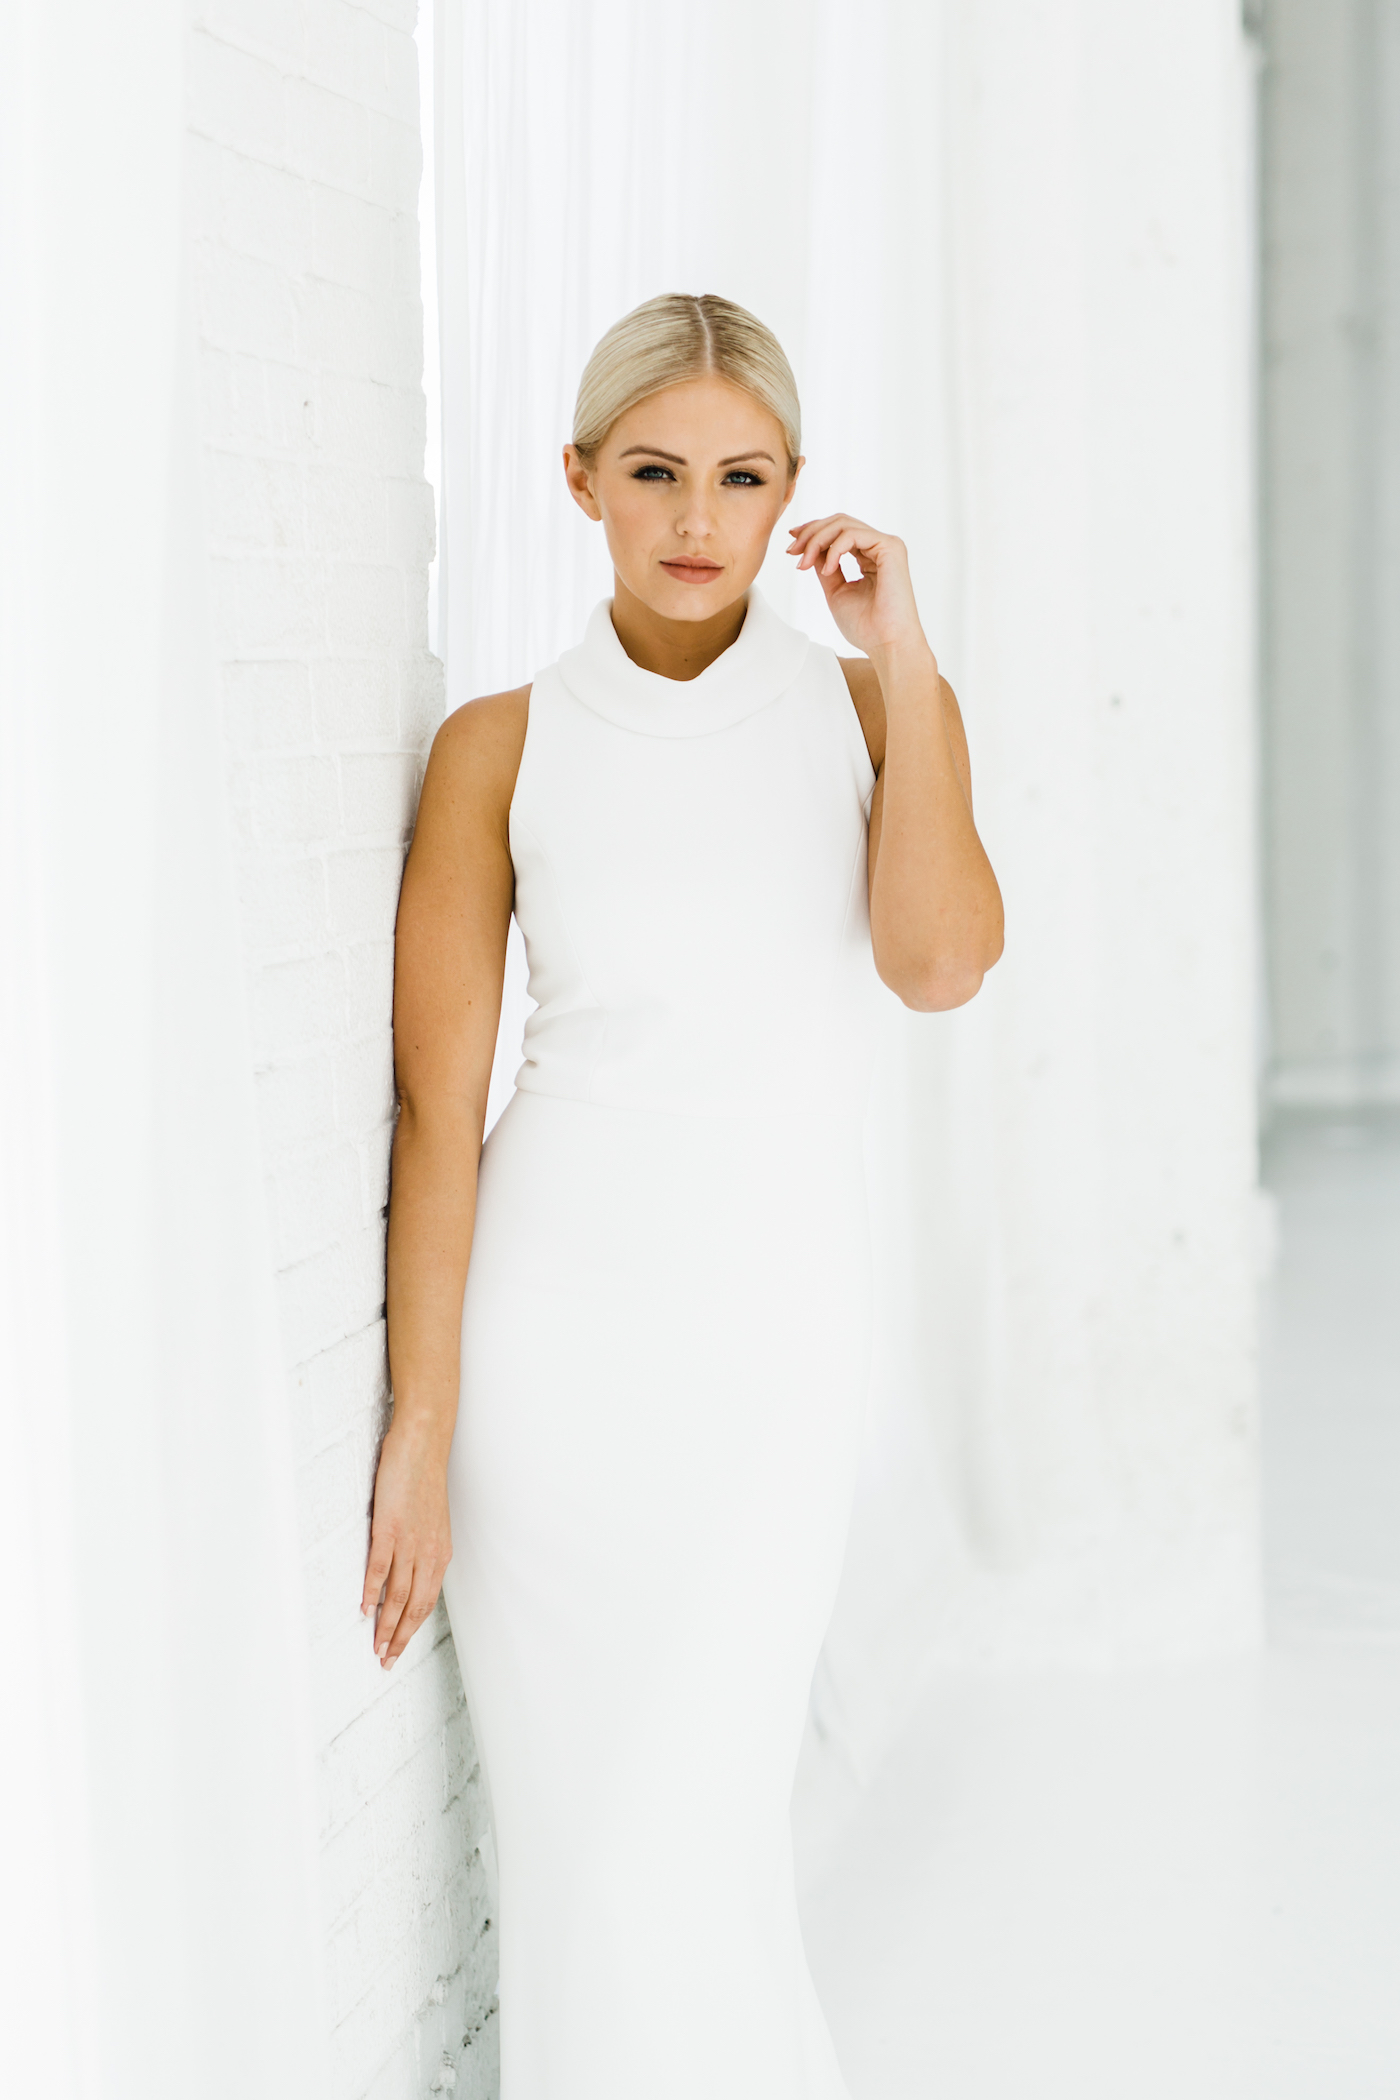 Alyssa Kristin on the LOVE FIND CO. Dress Concierge